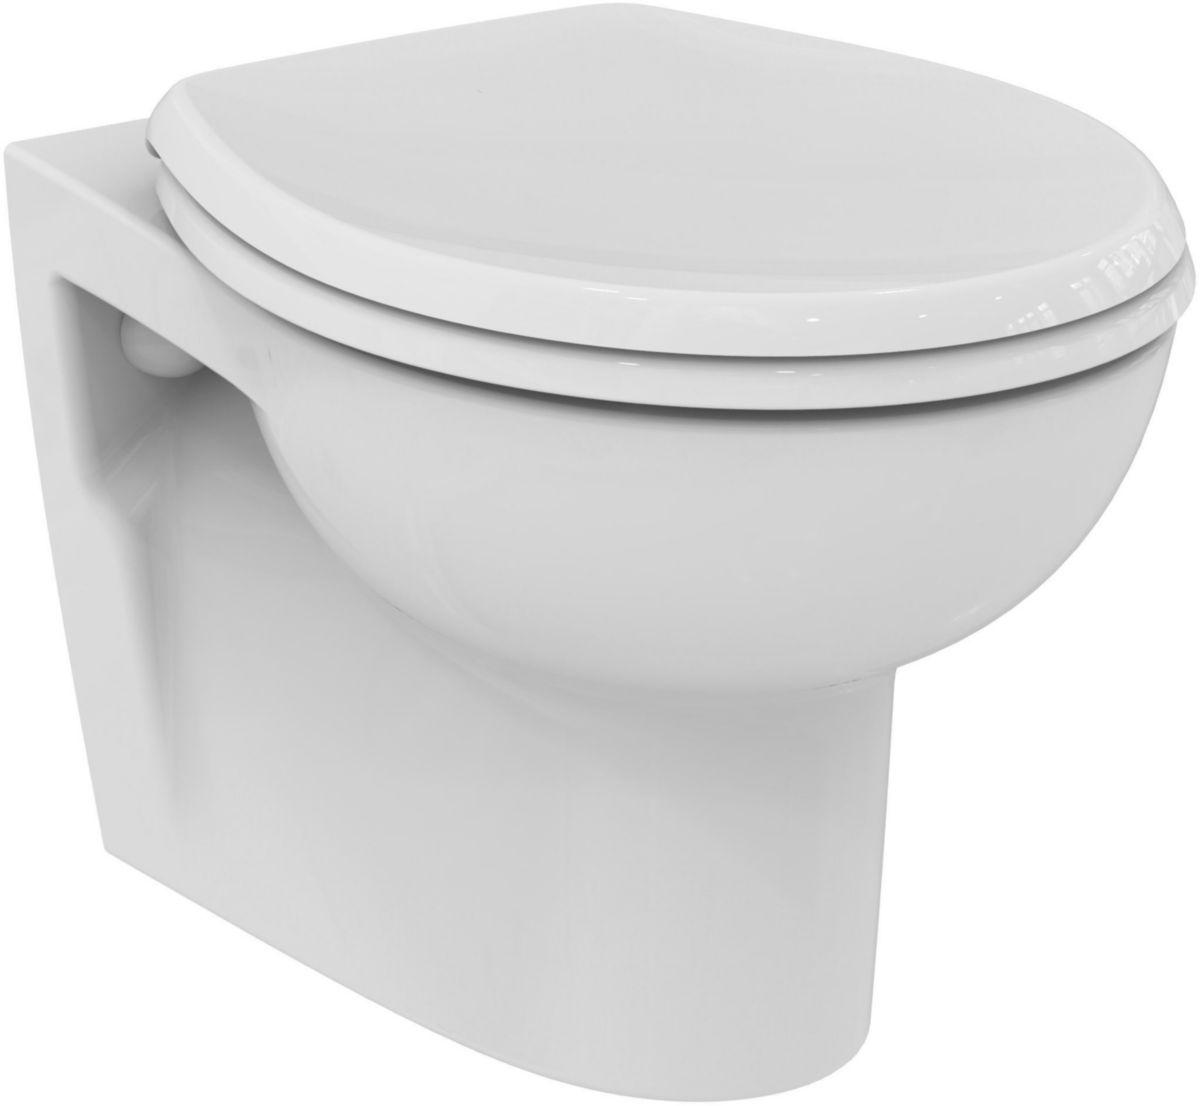 porcher pack wc suspendu hercule avec abattant standard blanc r f e300501 cedeo. Black Bedroom Furniture Sets. Home Design Ideas